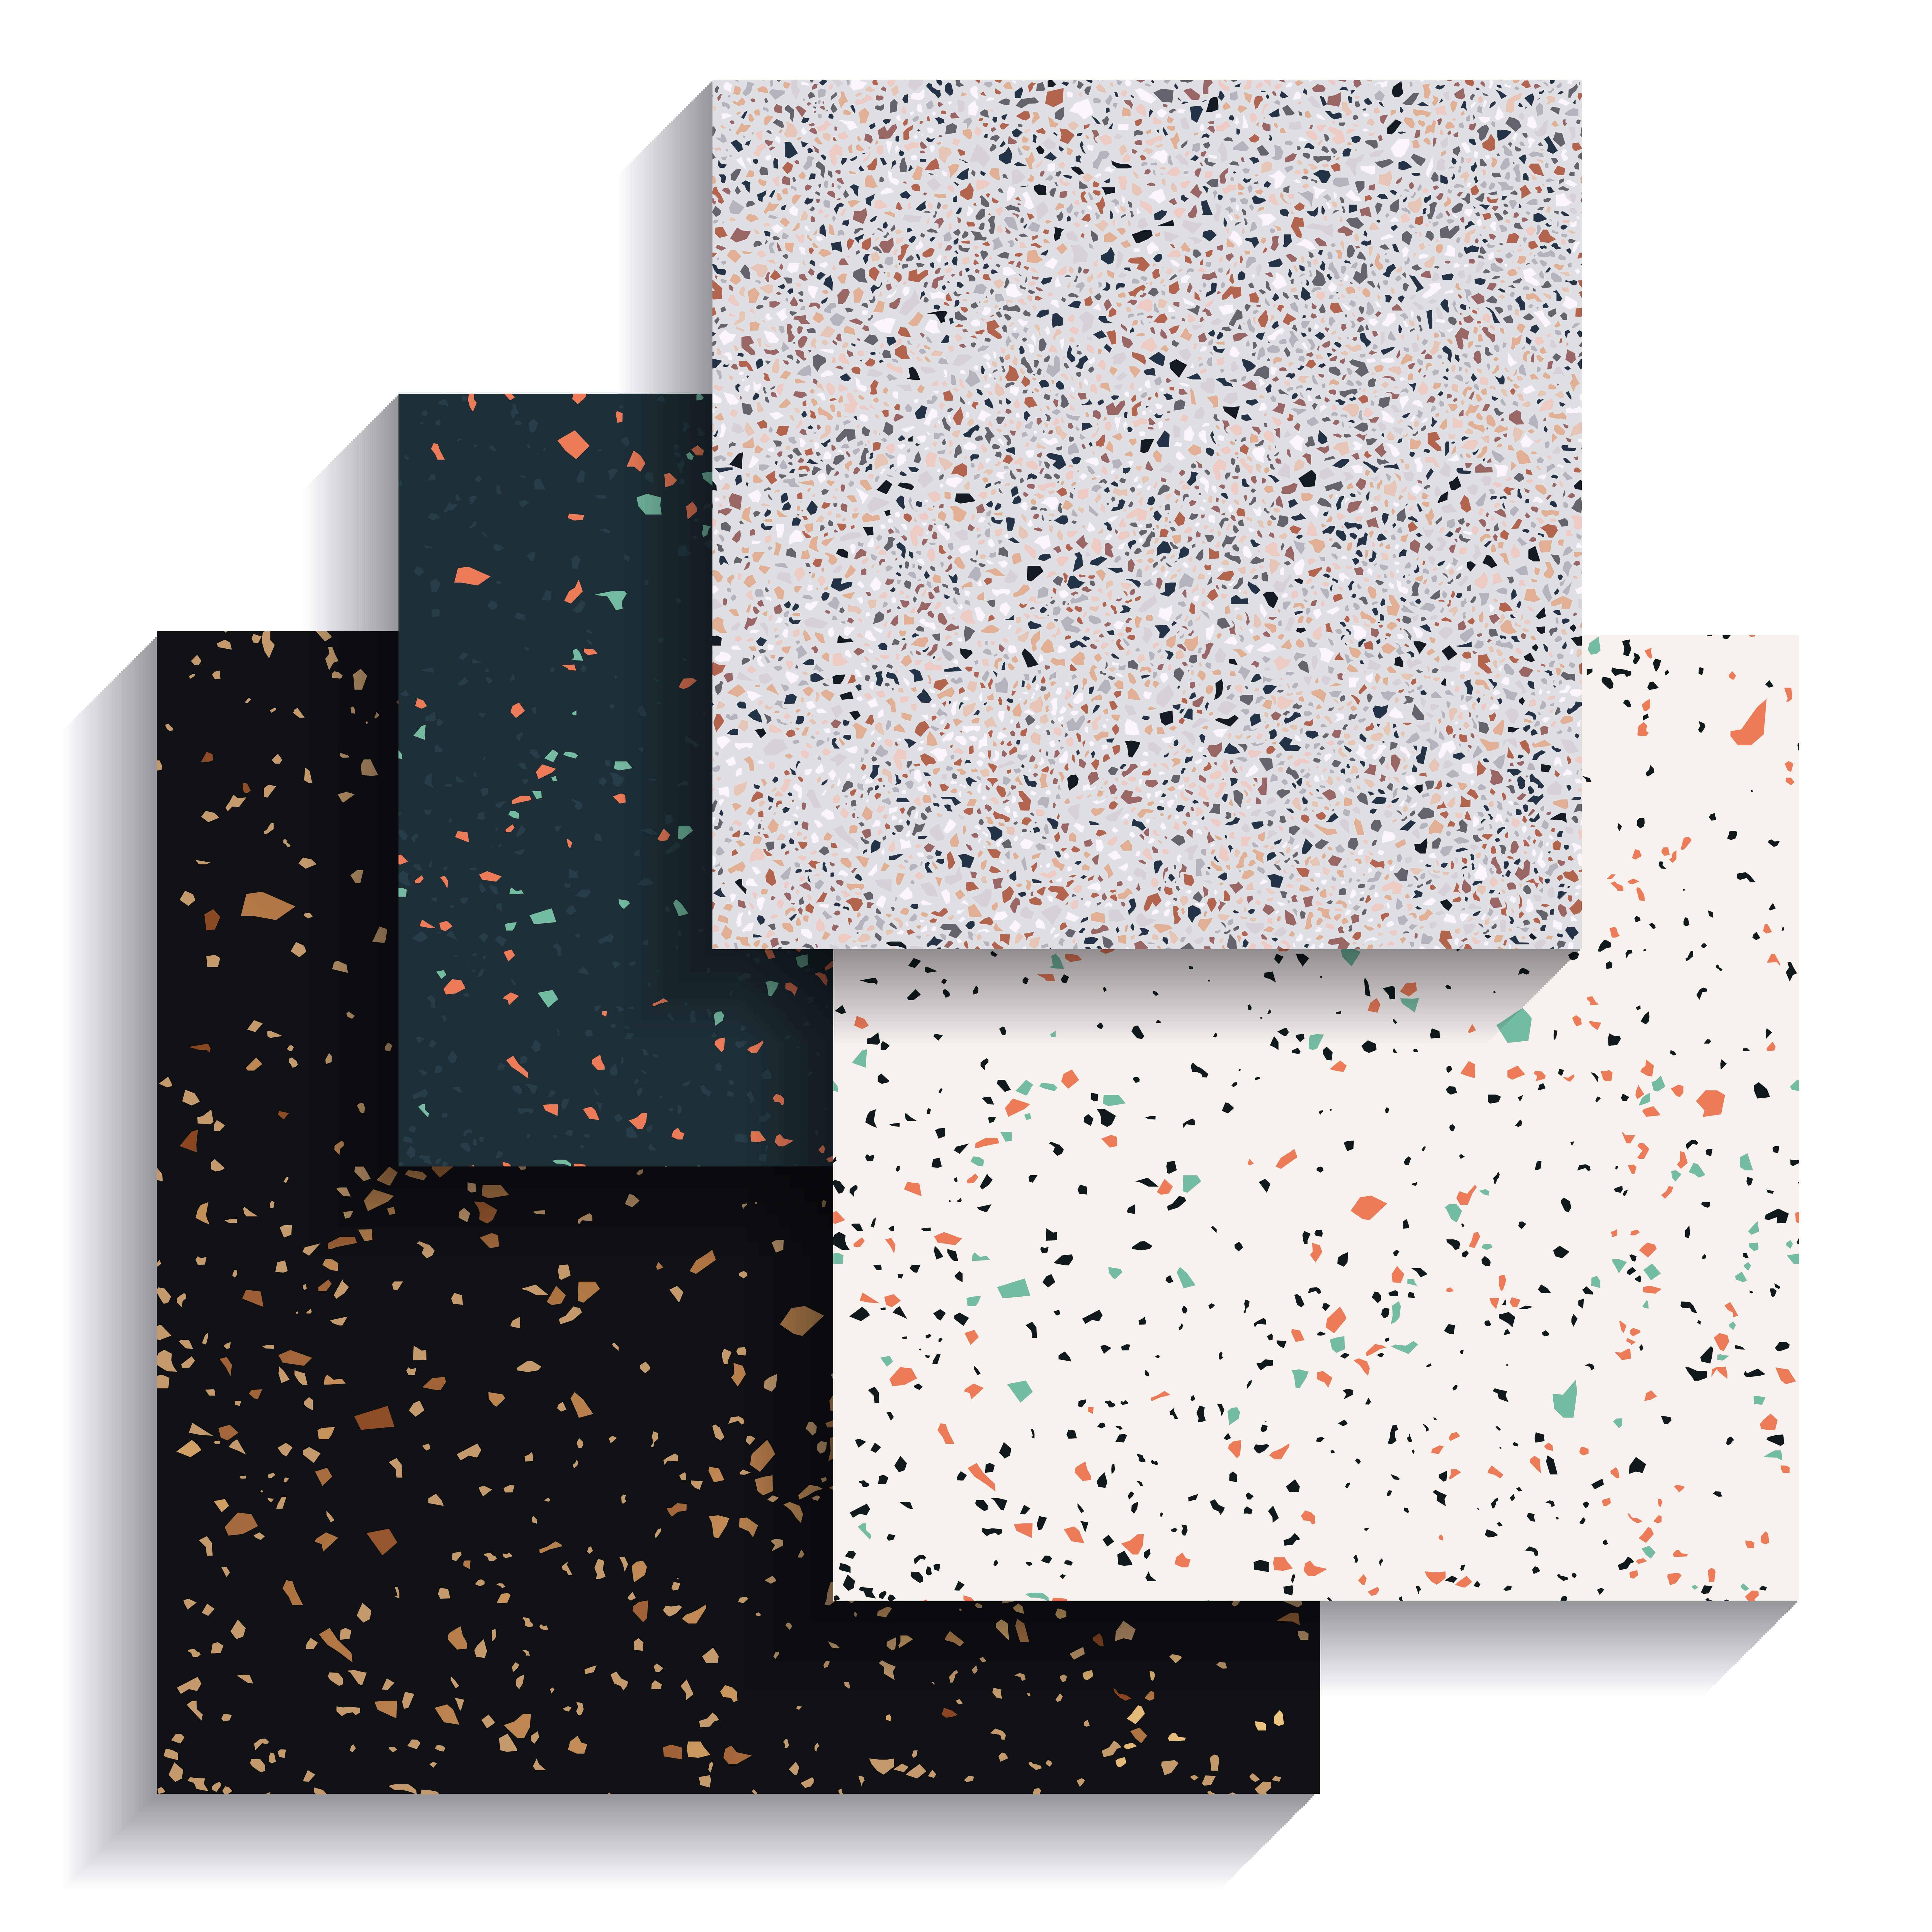 Terrazzo tile flooring